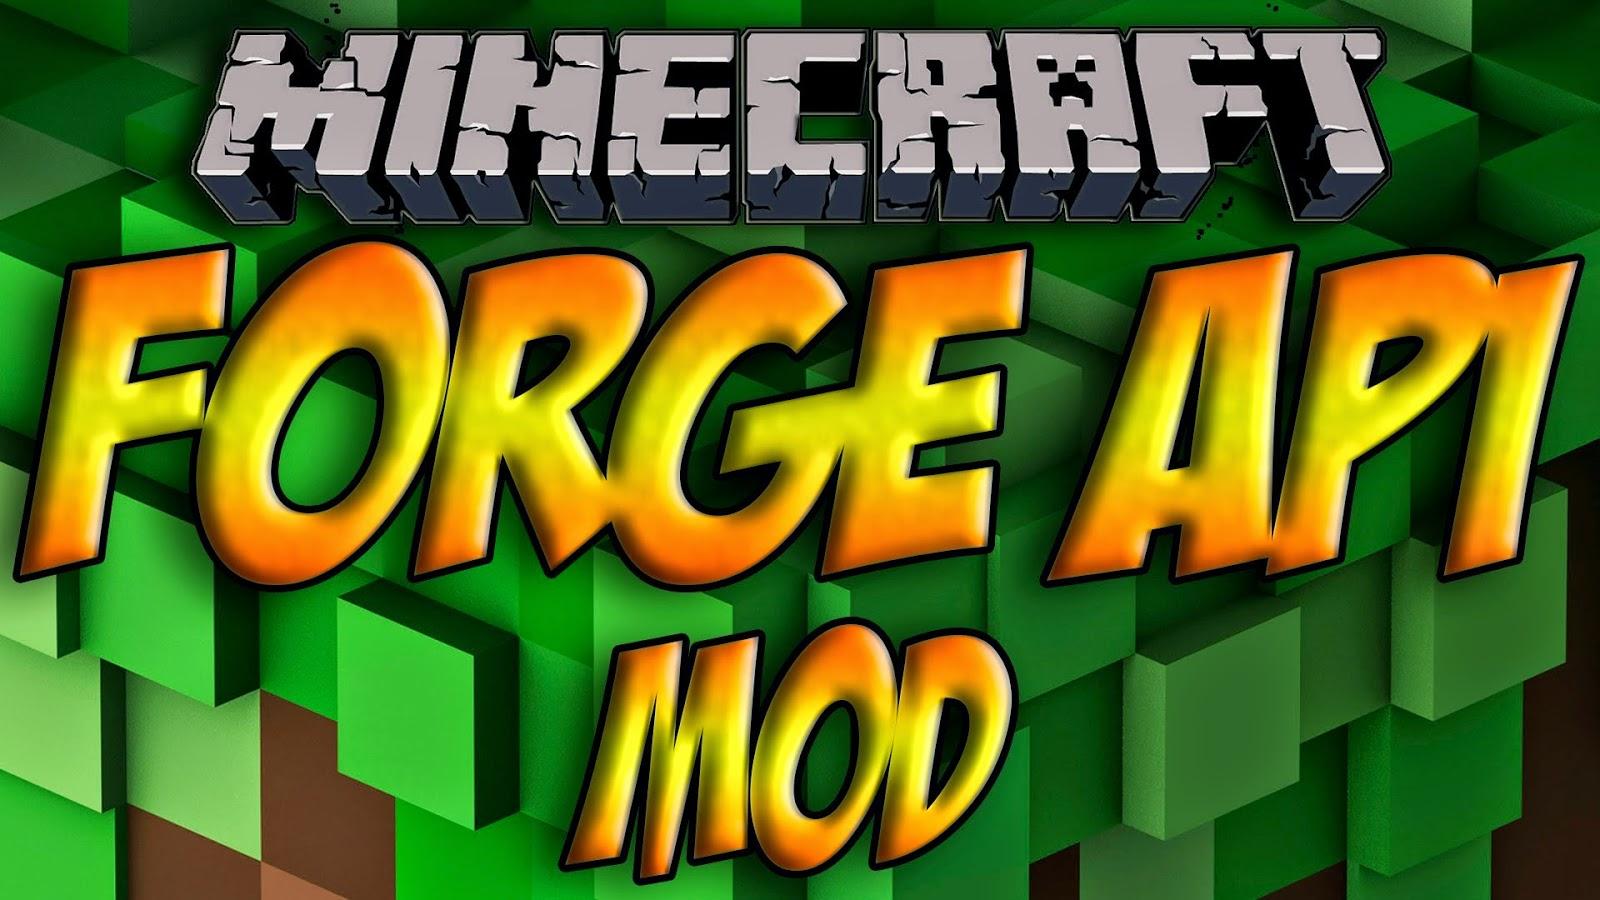 Minecraft Forge API para la 1.7.2, minecraft forge, forge 1.7.2, forge, minecraft mods, minecraft, descargar minecraft, mods para minecraft, cómo instalar mods, minecraft cómo instalar mods